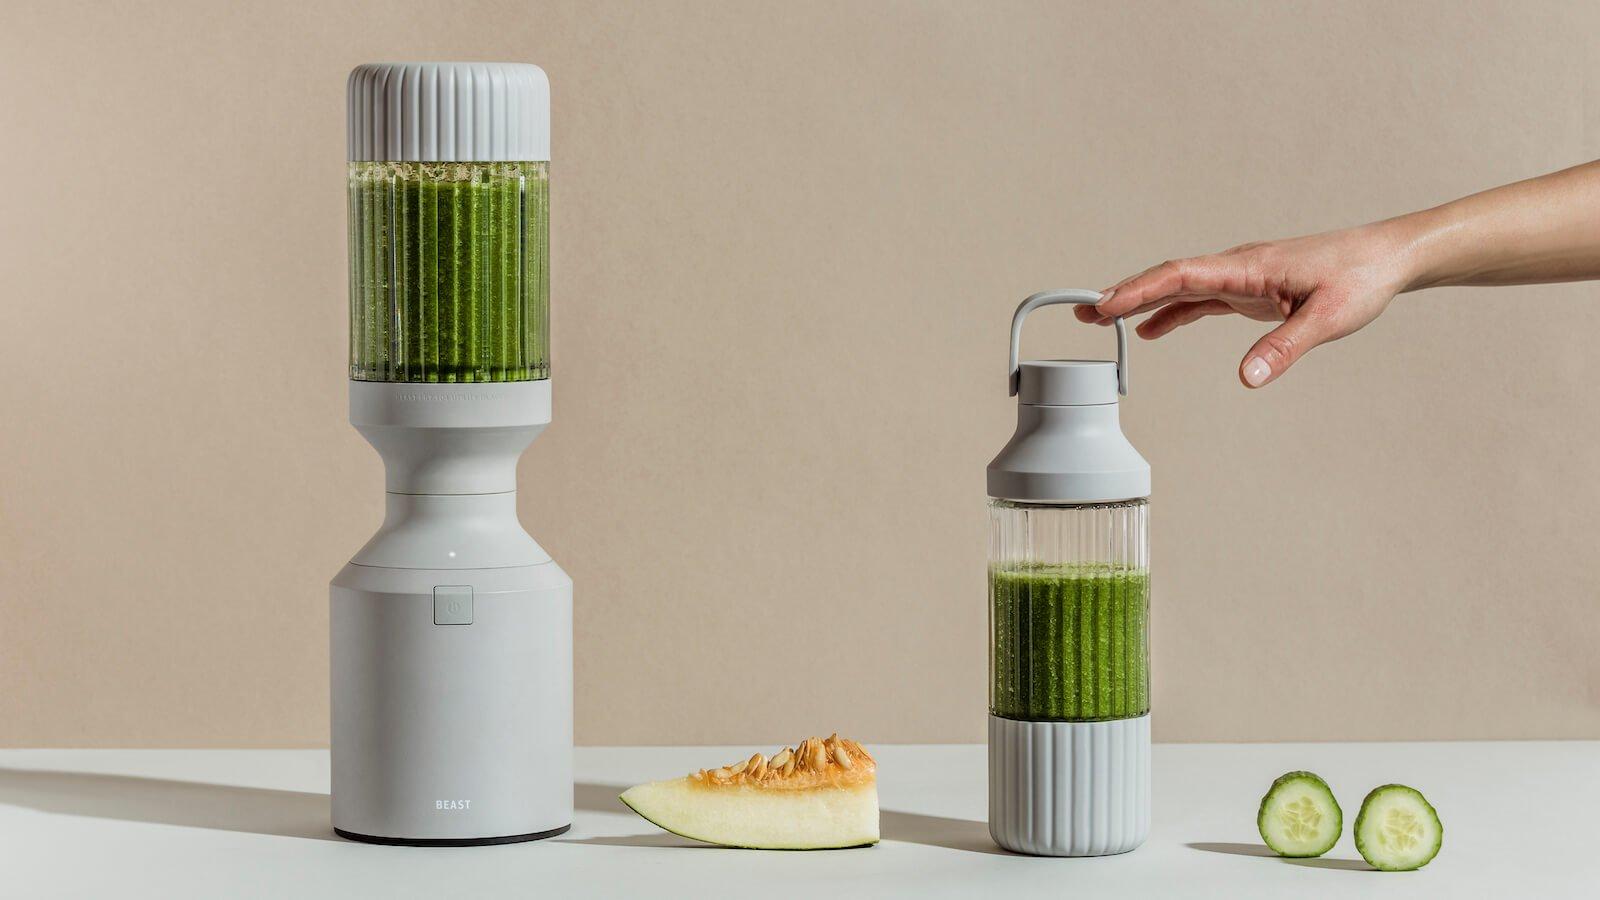 New kitchen gadgets worth buying